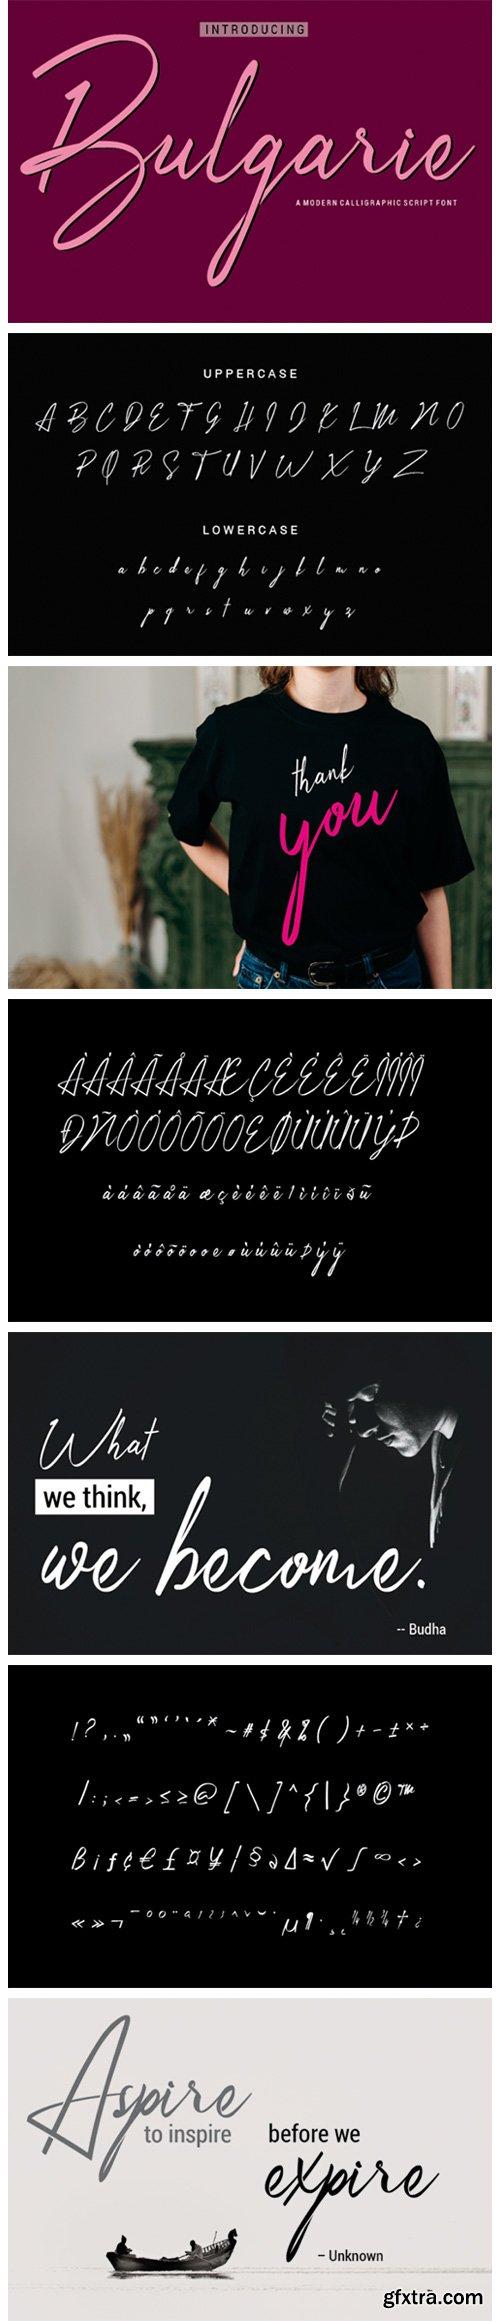 Bulgarie Font